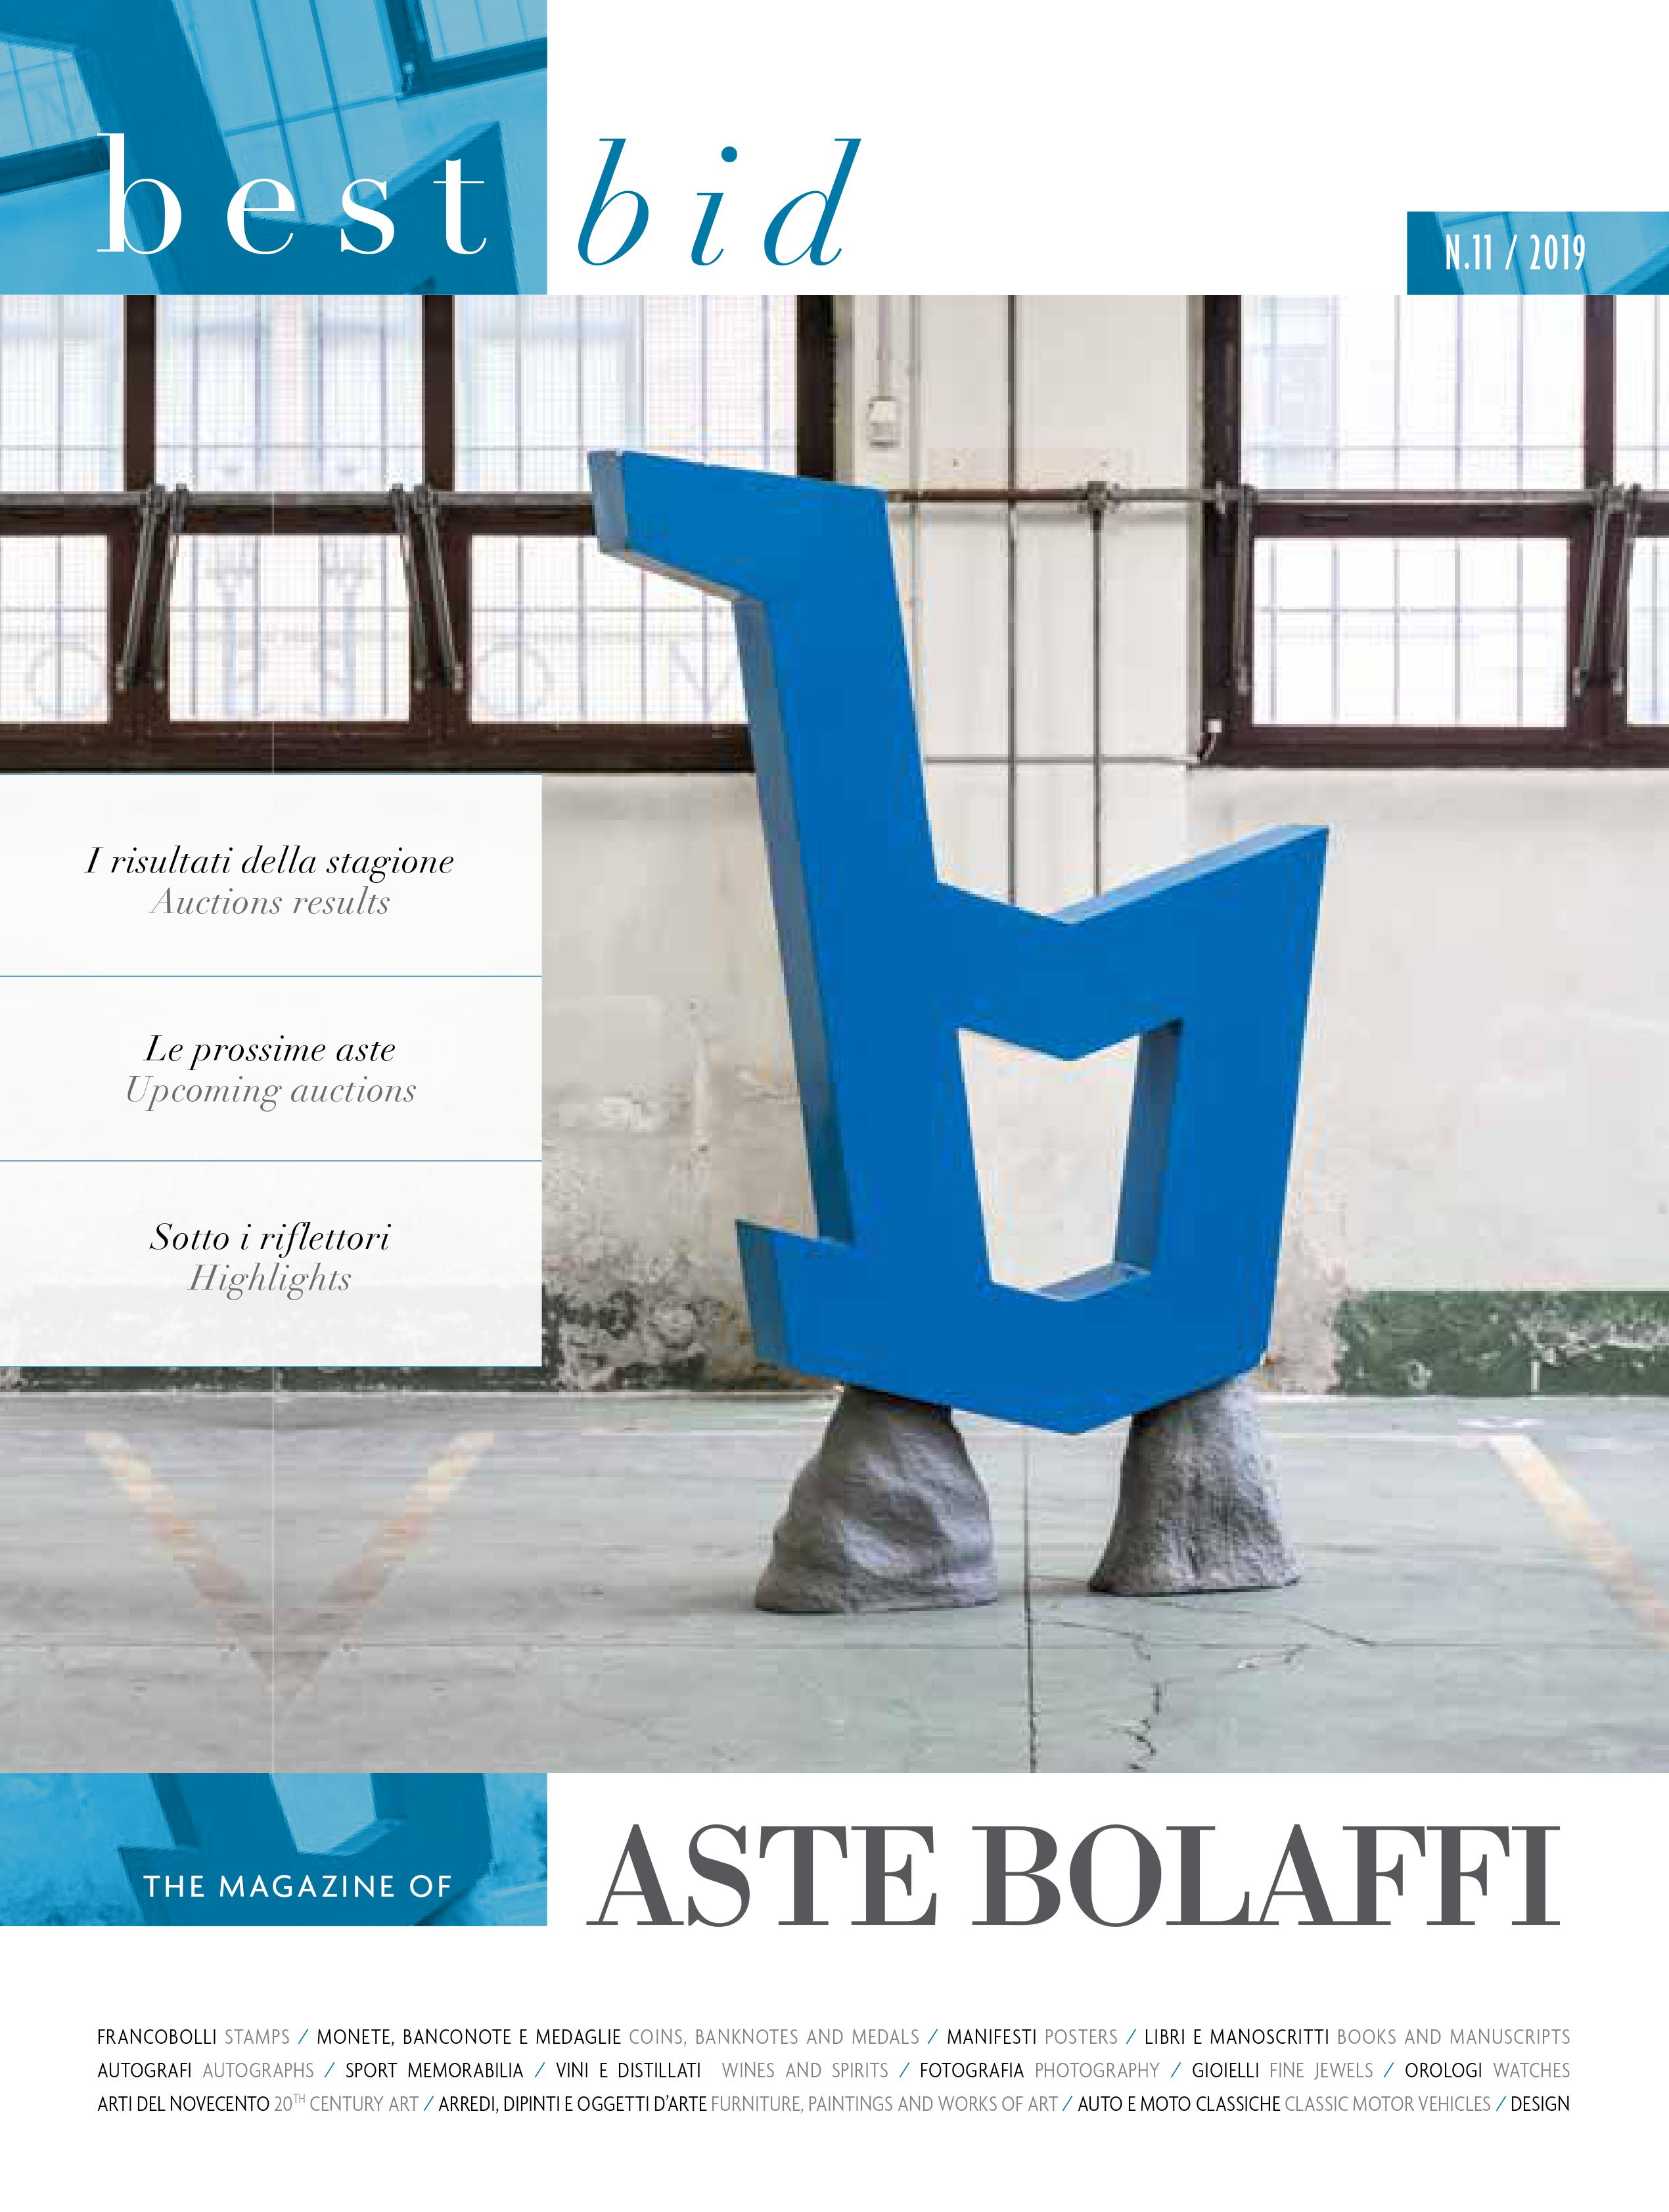 a9169ff8be Best Bid: il magazine di Aste Bolaffi | Aste Bolaffi